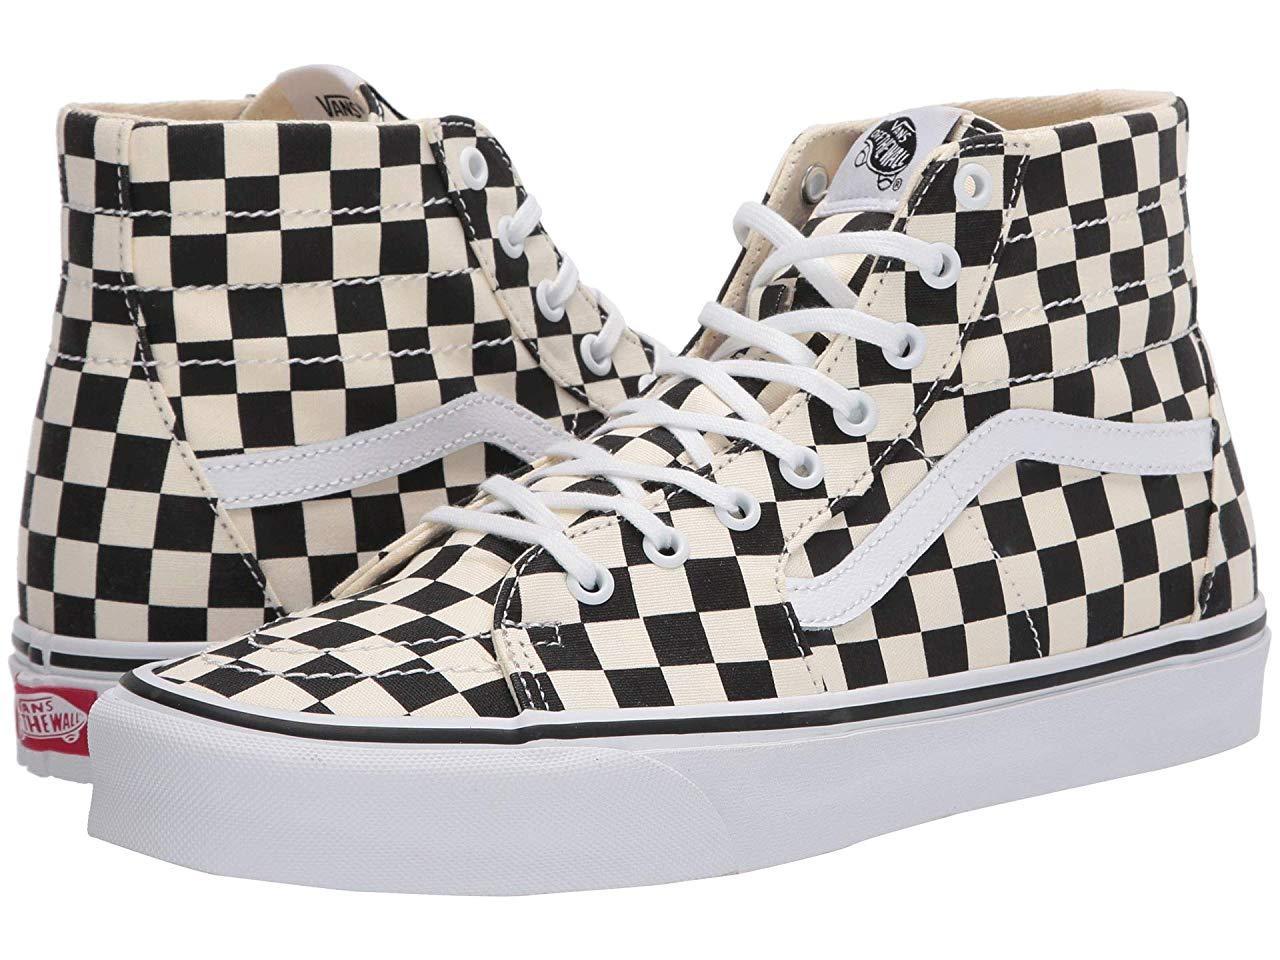 Кроссовки/Кеды Vans Sk8-Hi™ Tapered (Checkerboard) Black/True White